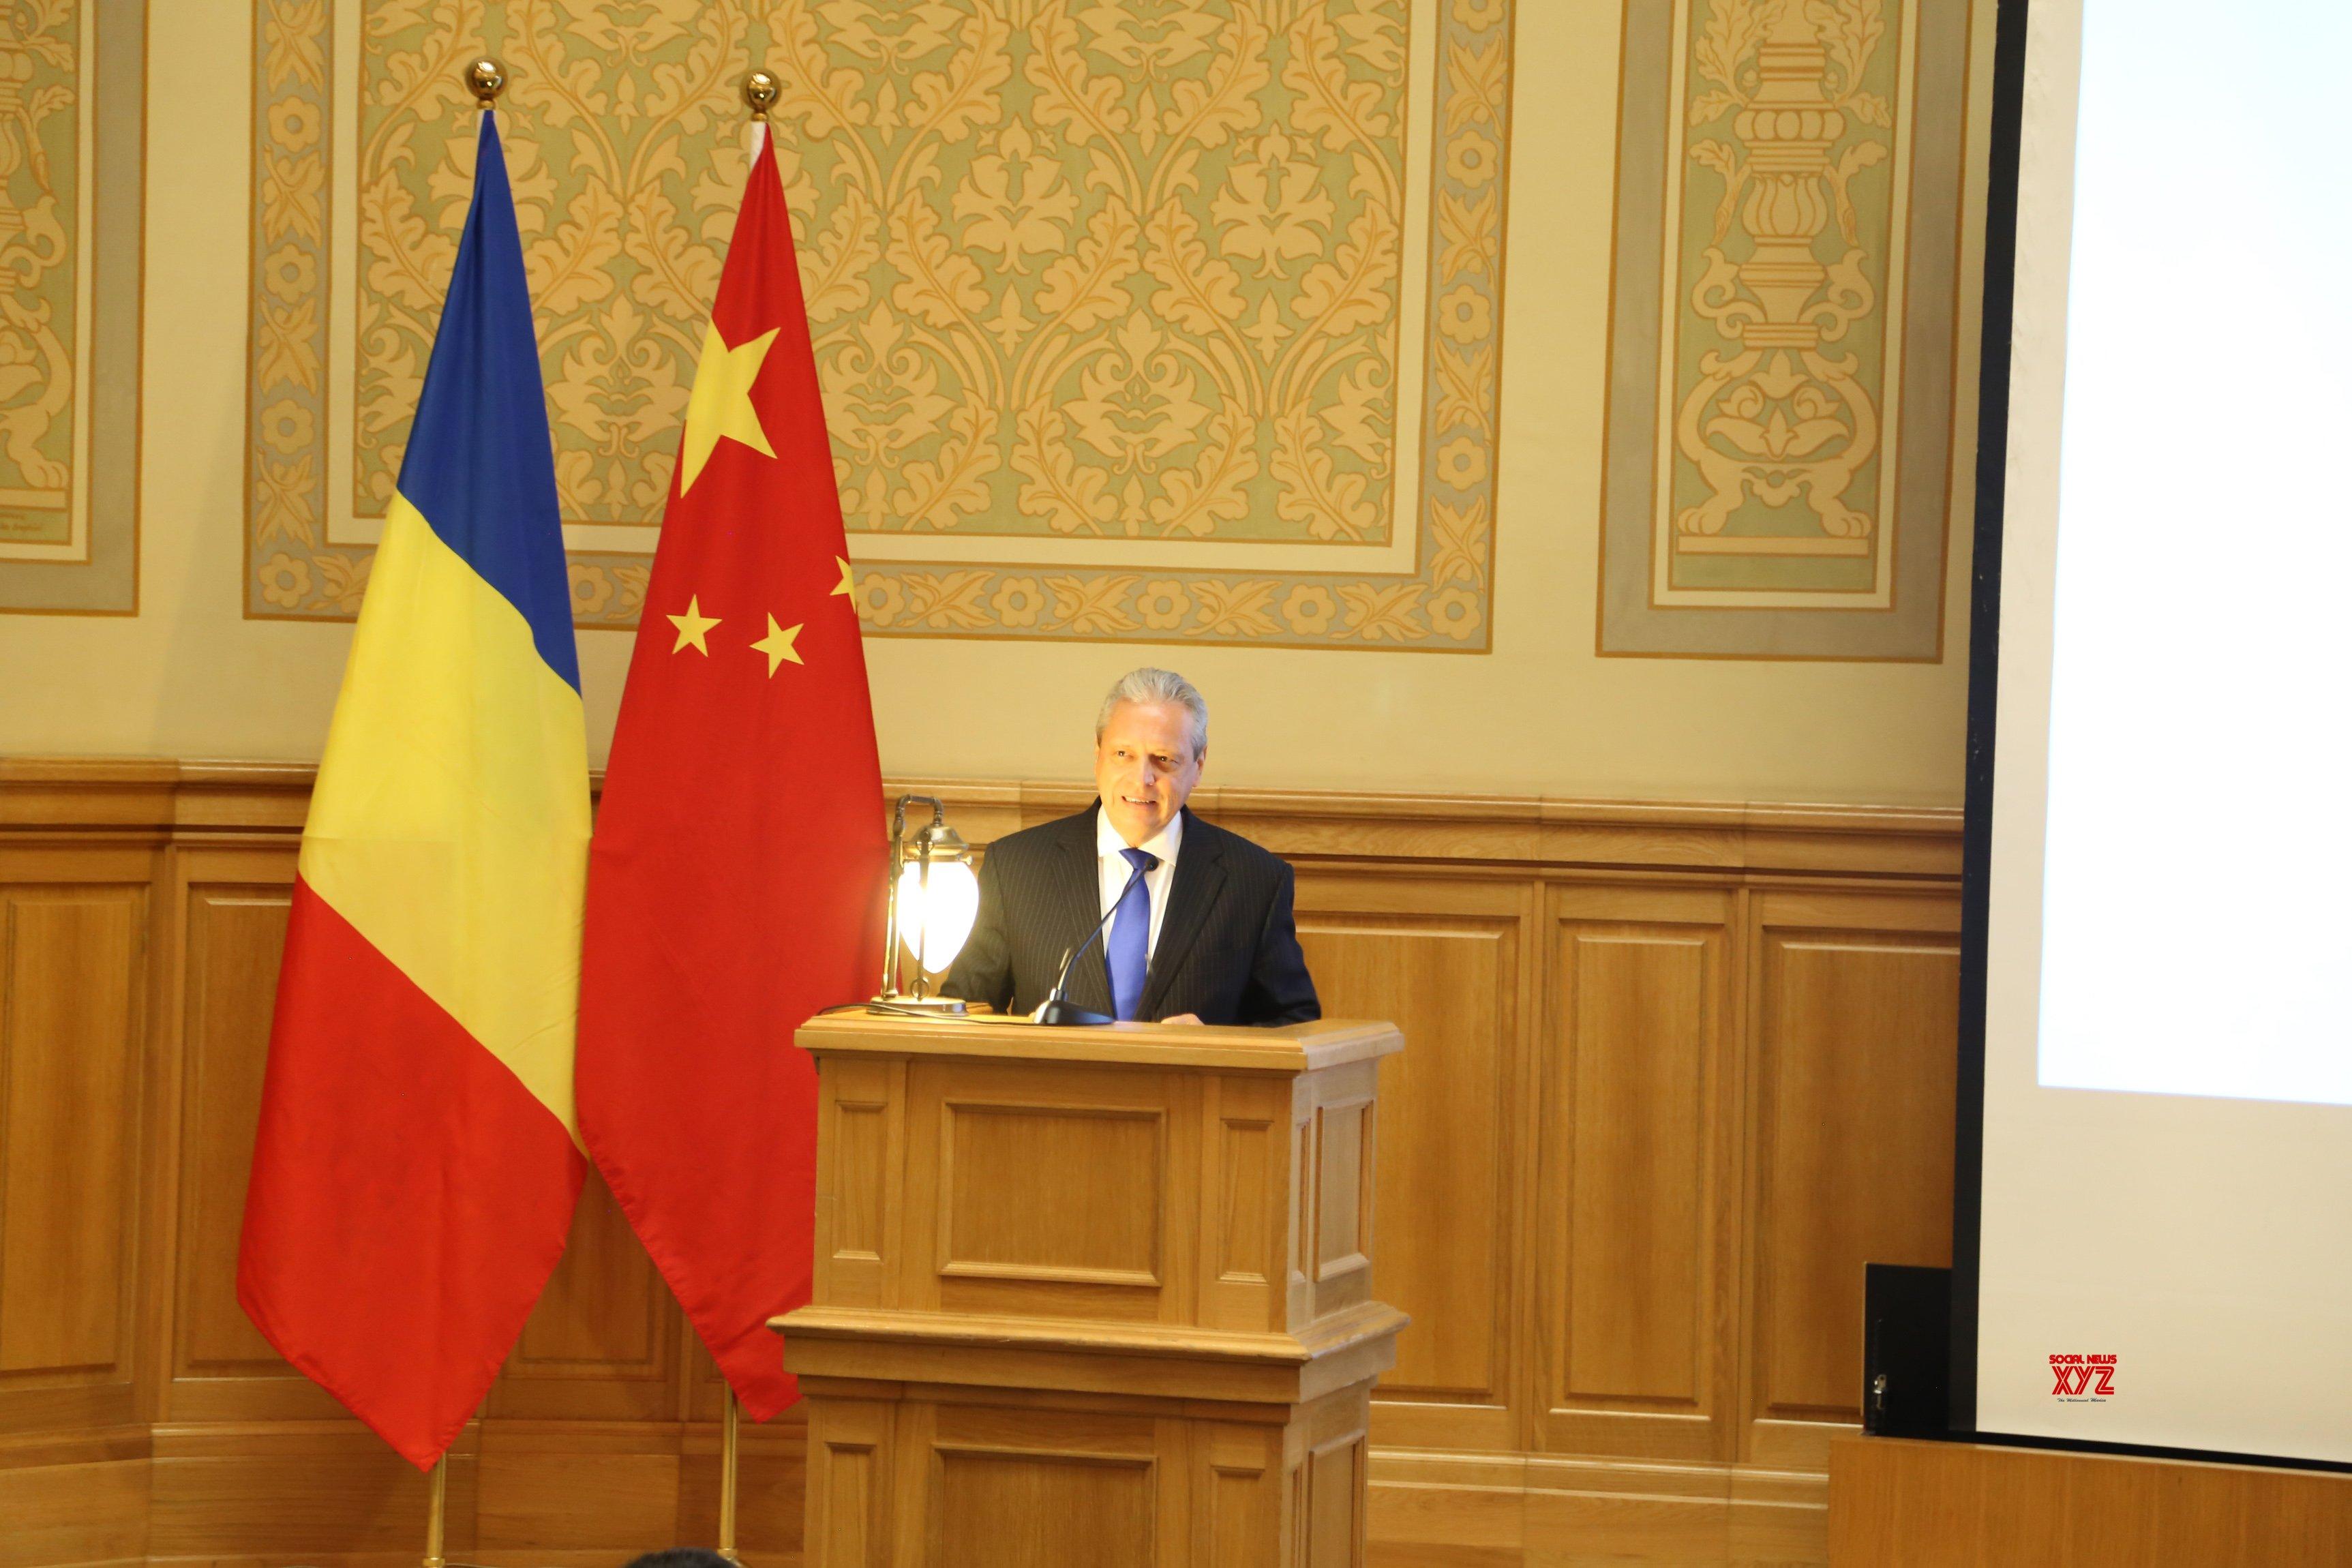 ROMANIA - BUCHAREST - CHINA - DIPLOMATIC RELATIONS - SEMINAR #Gallery